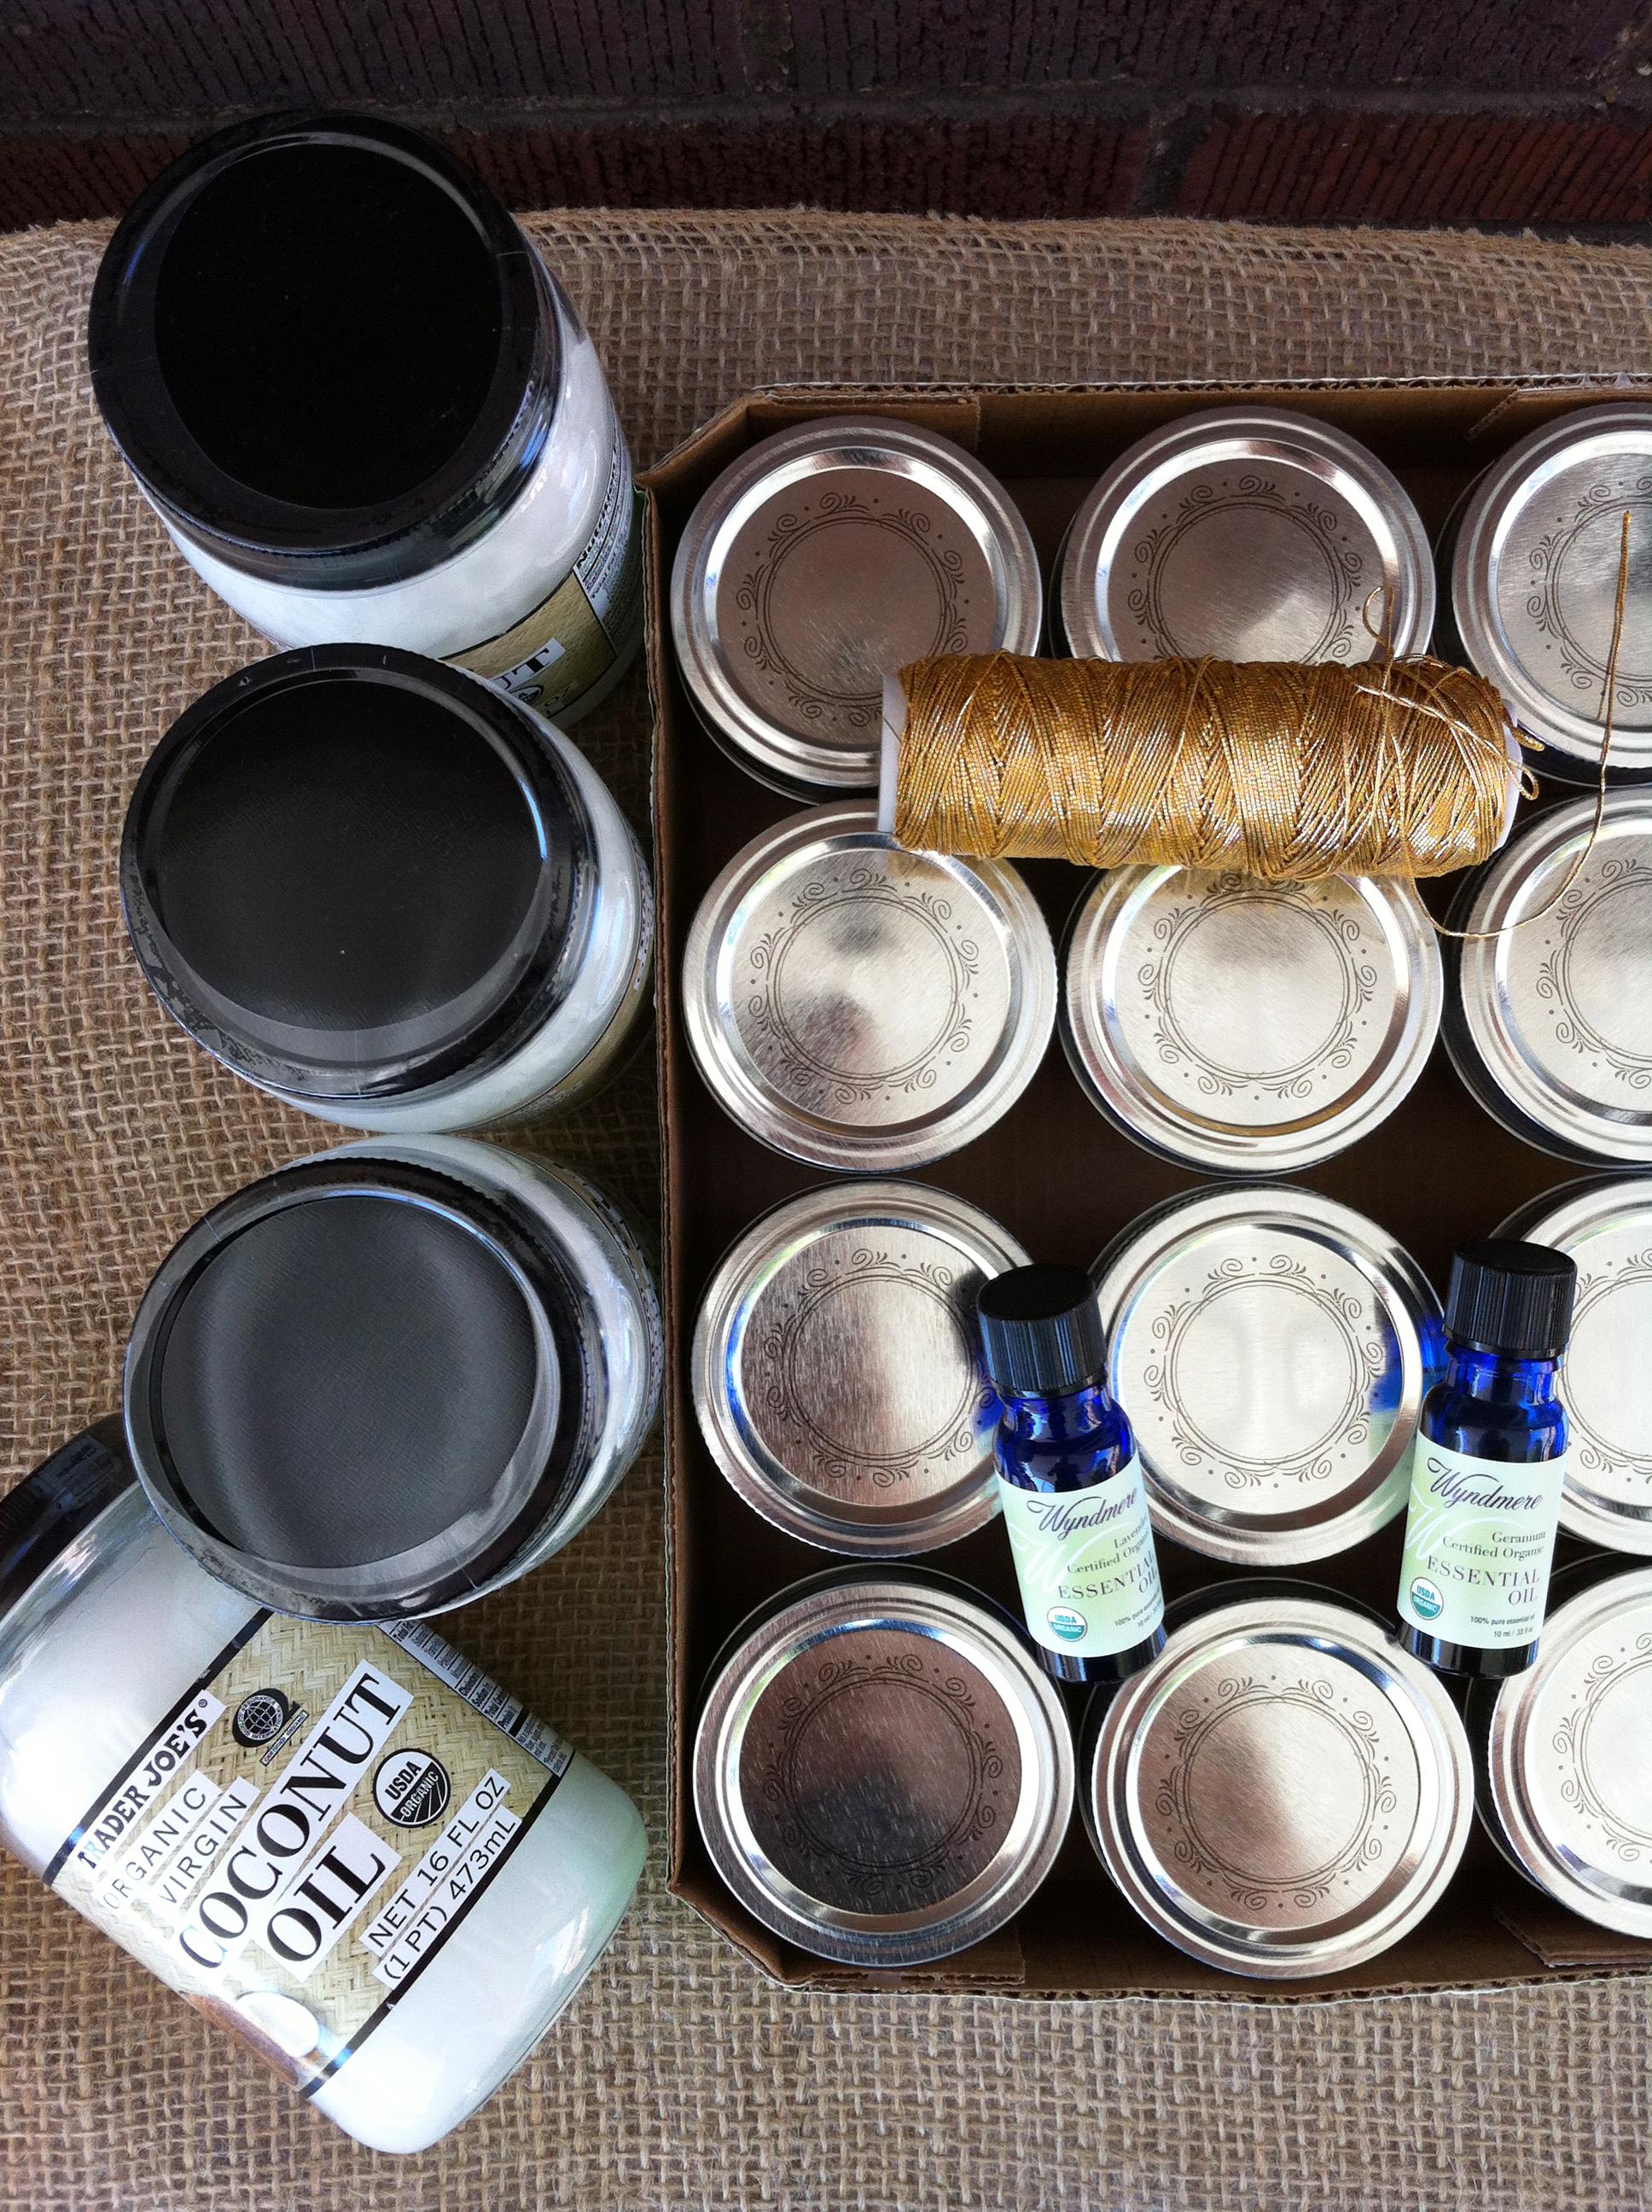 Homemade Coconut Oil Lotion Recipe - materials